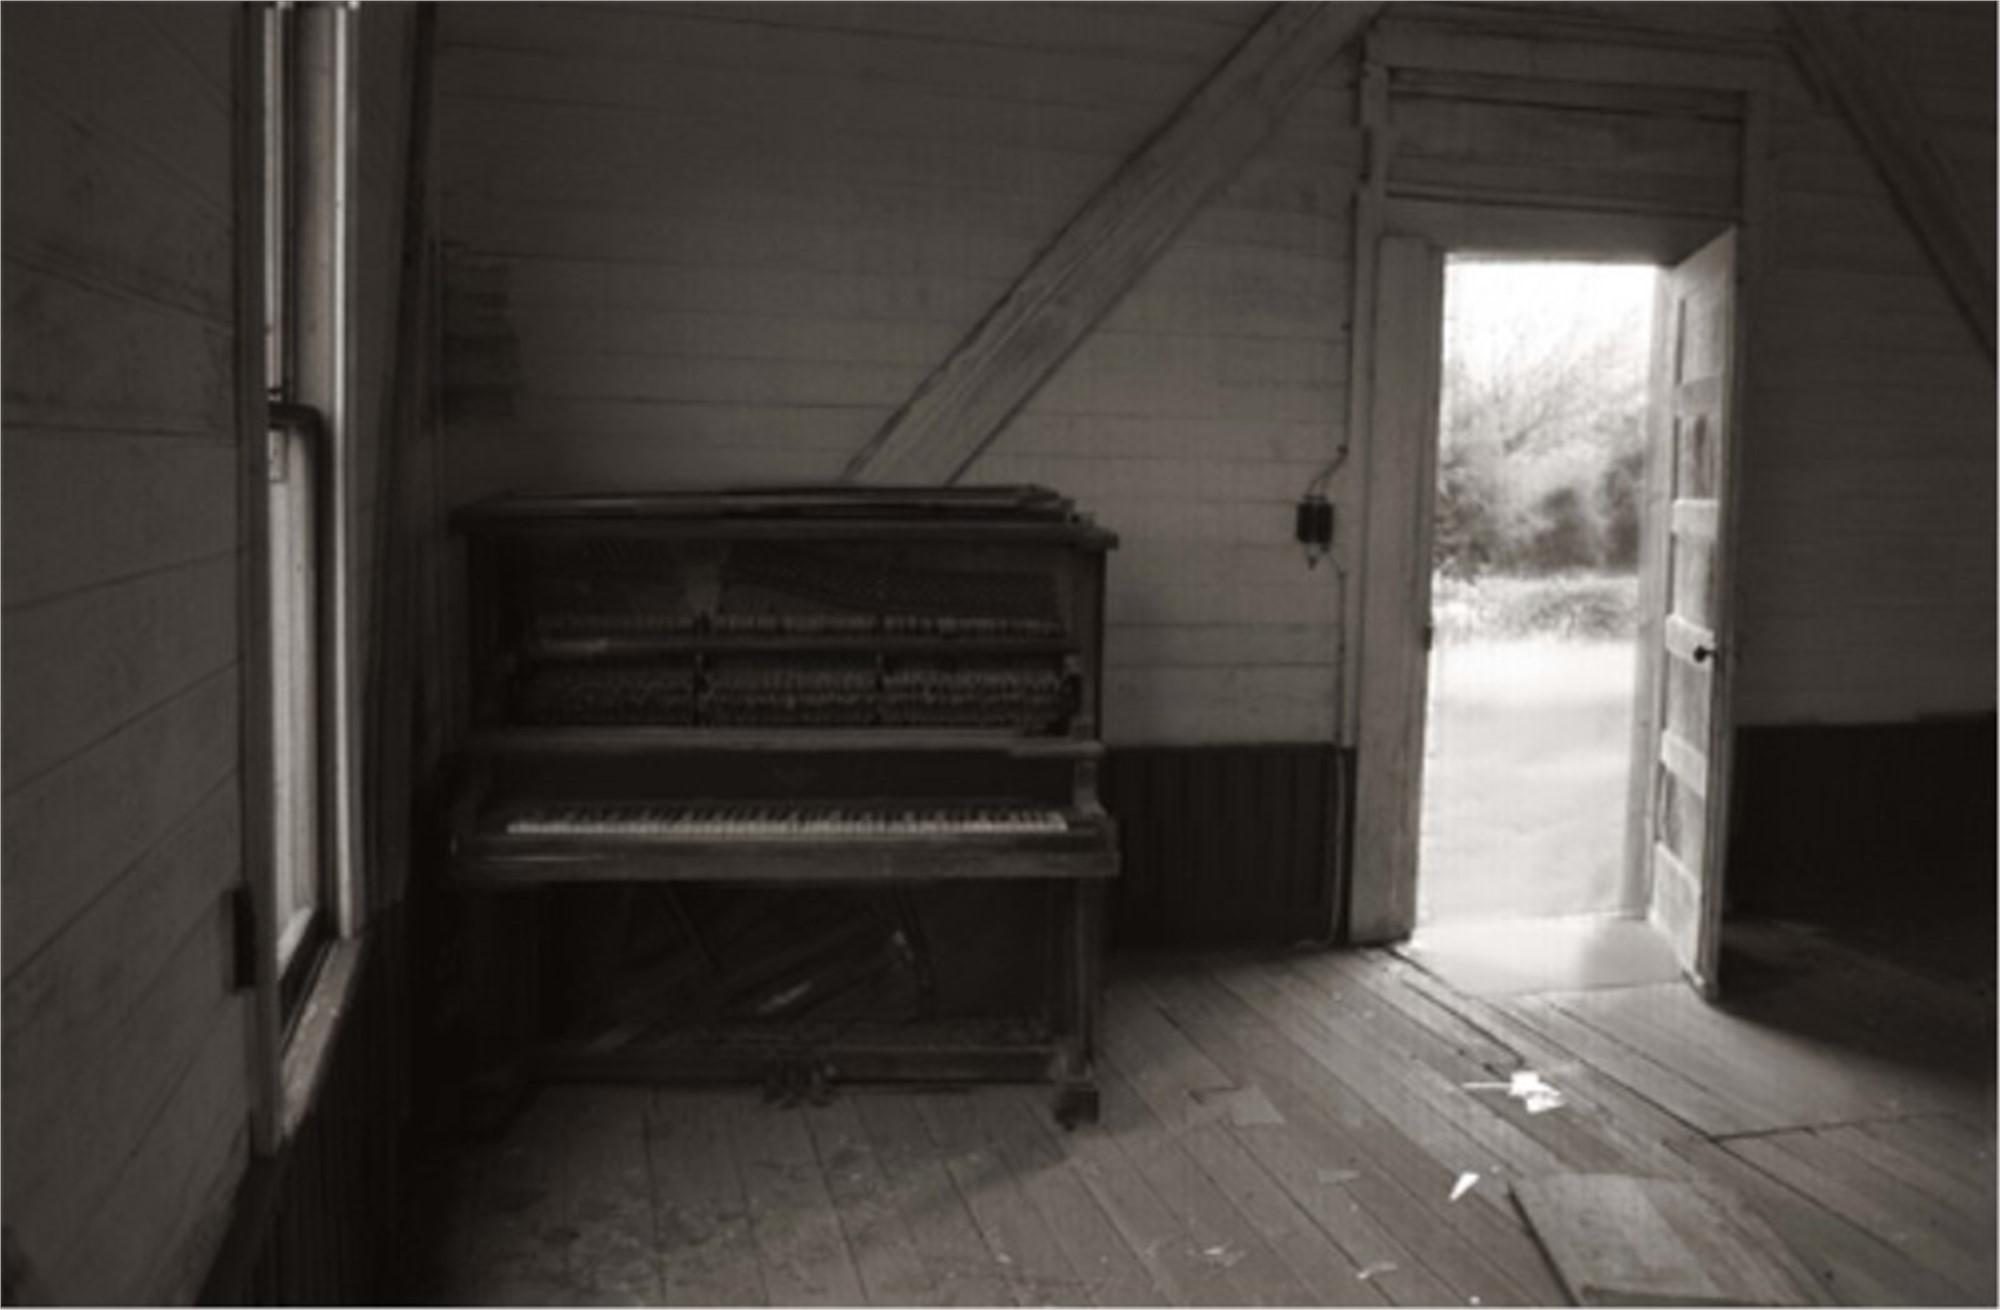 Piano, Colorado County, TX by Tommy LaVergne